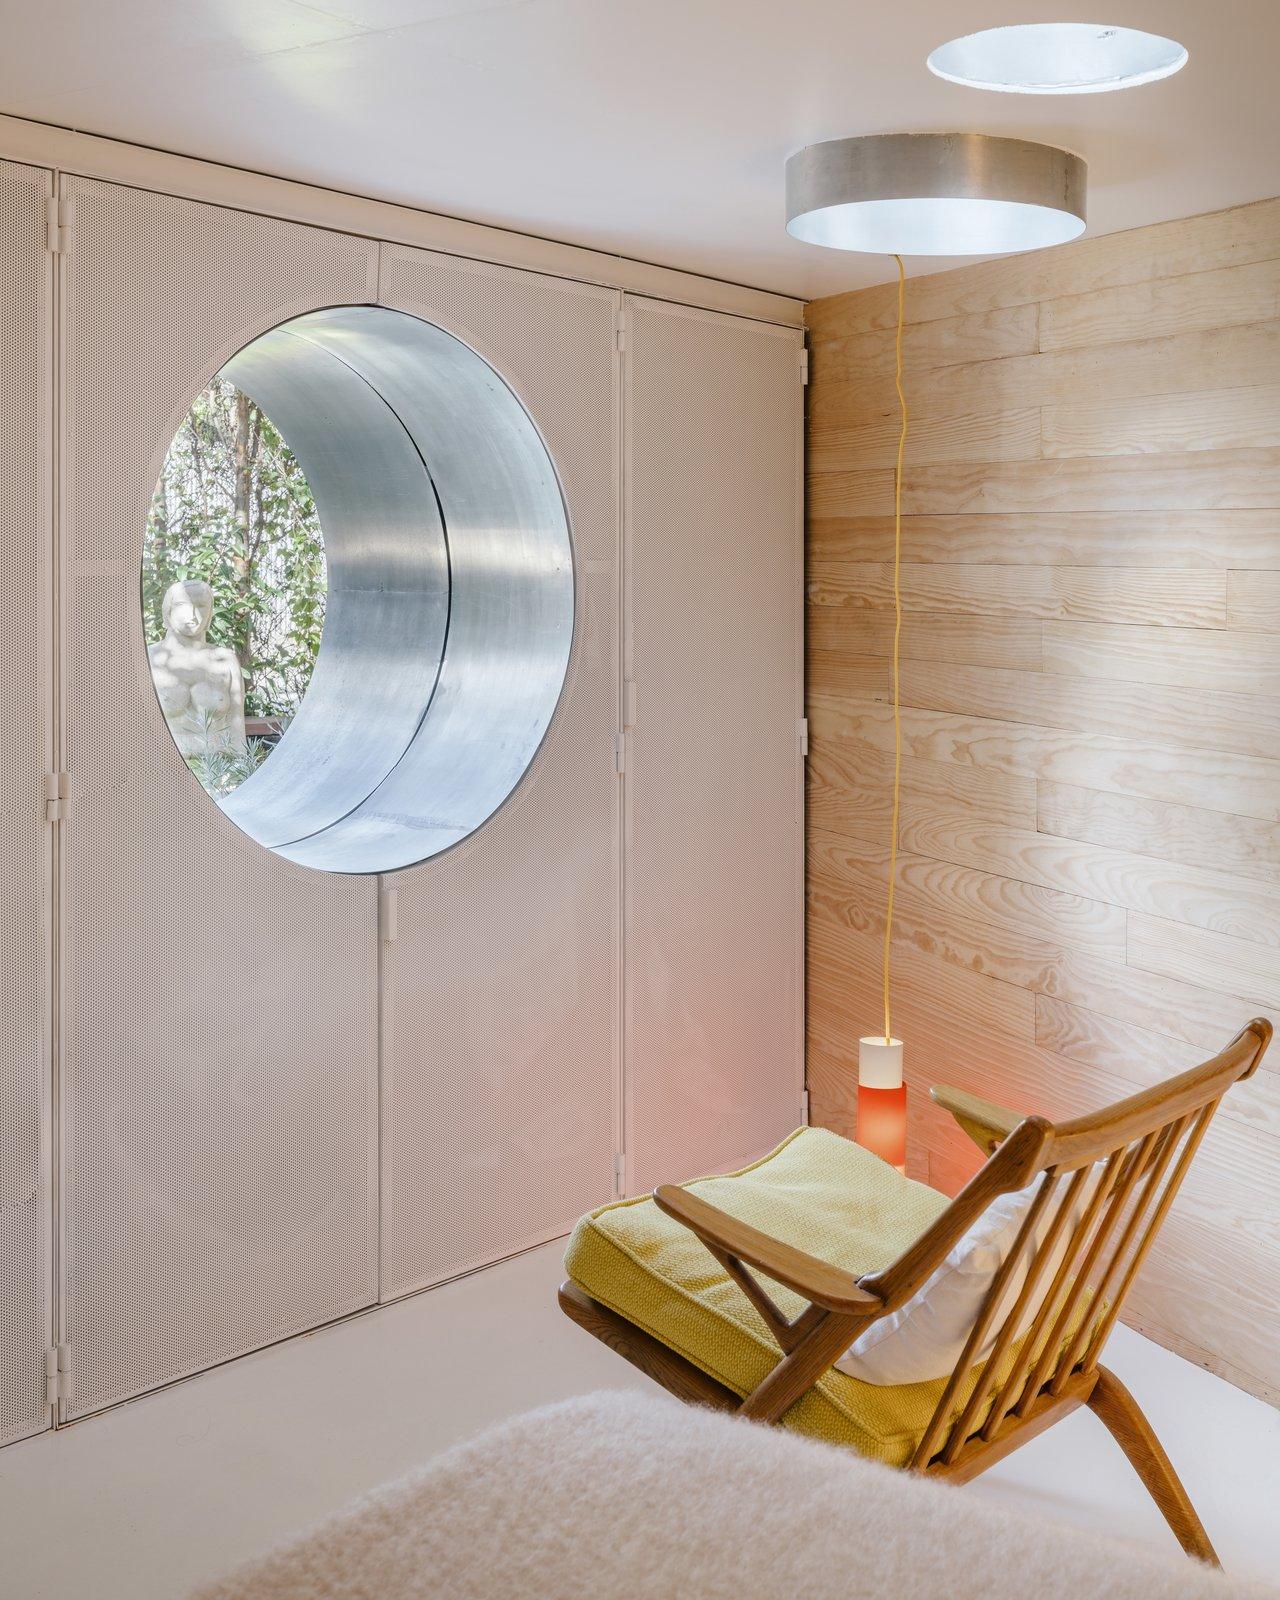 Closet and oculus window of La Madriguera by delavegacanolasso